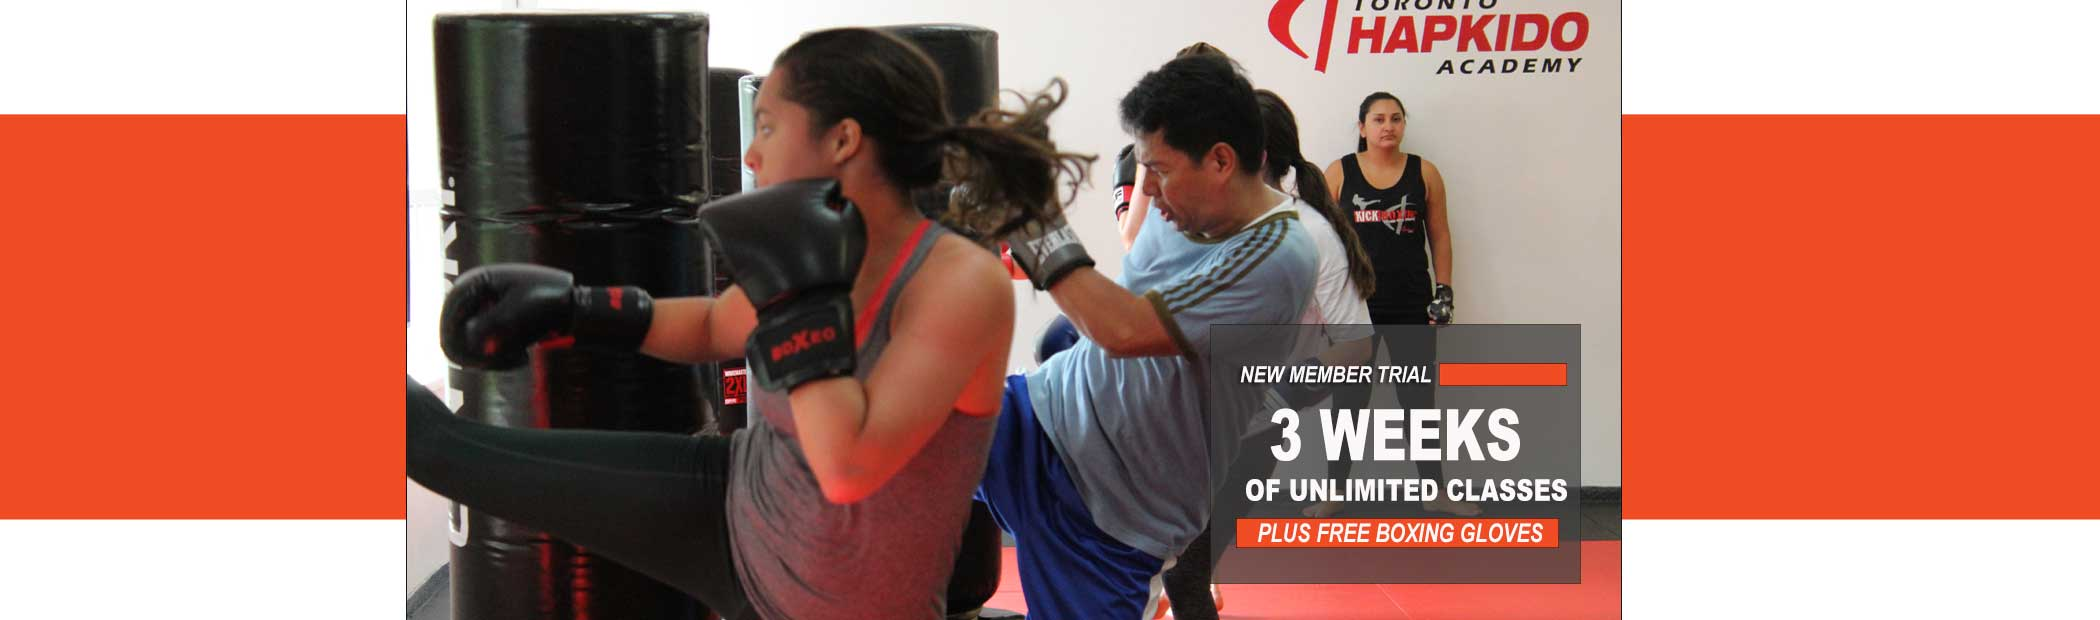 kickboxing classes north york